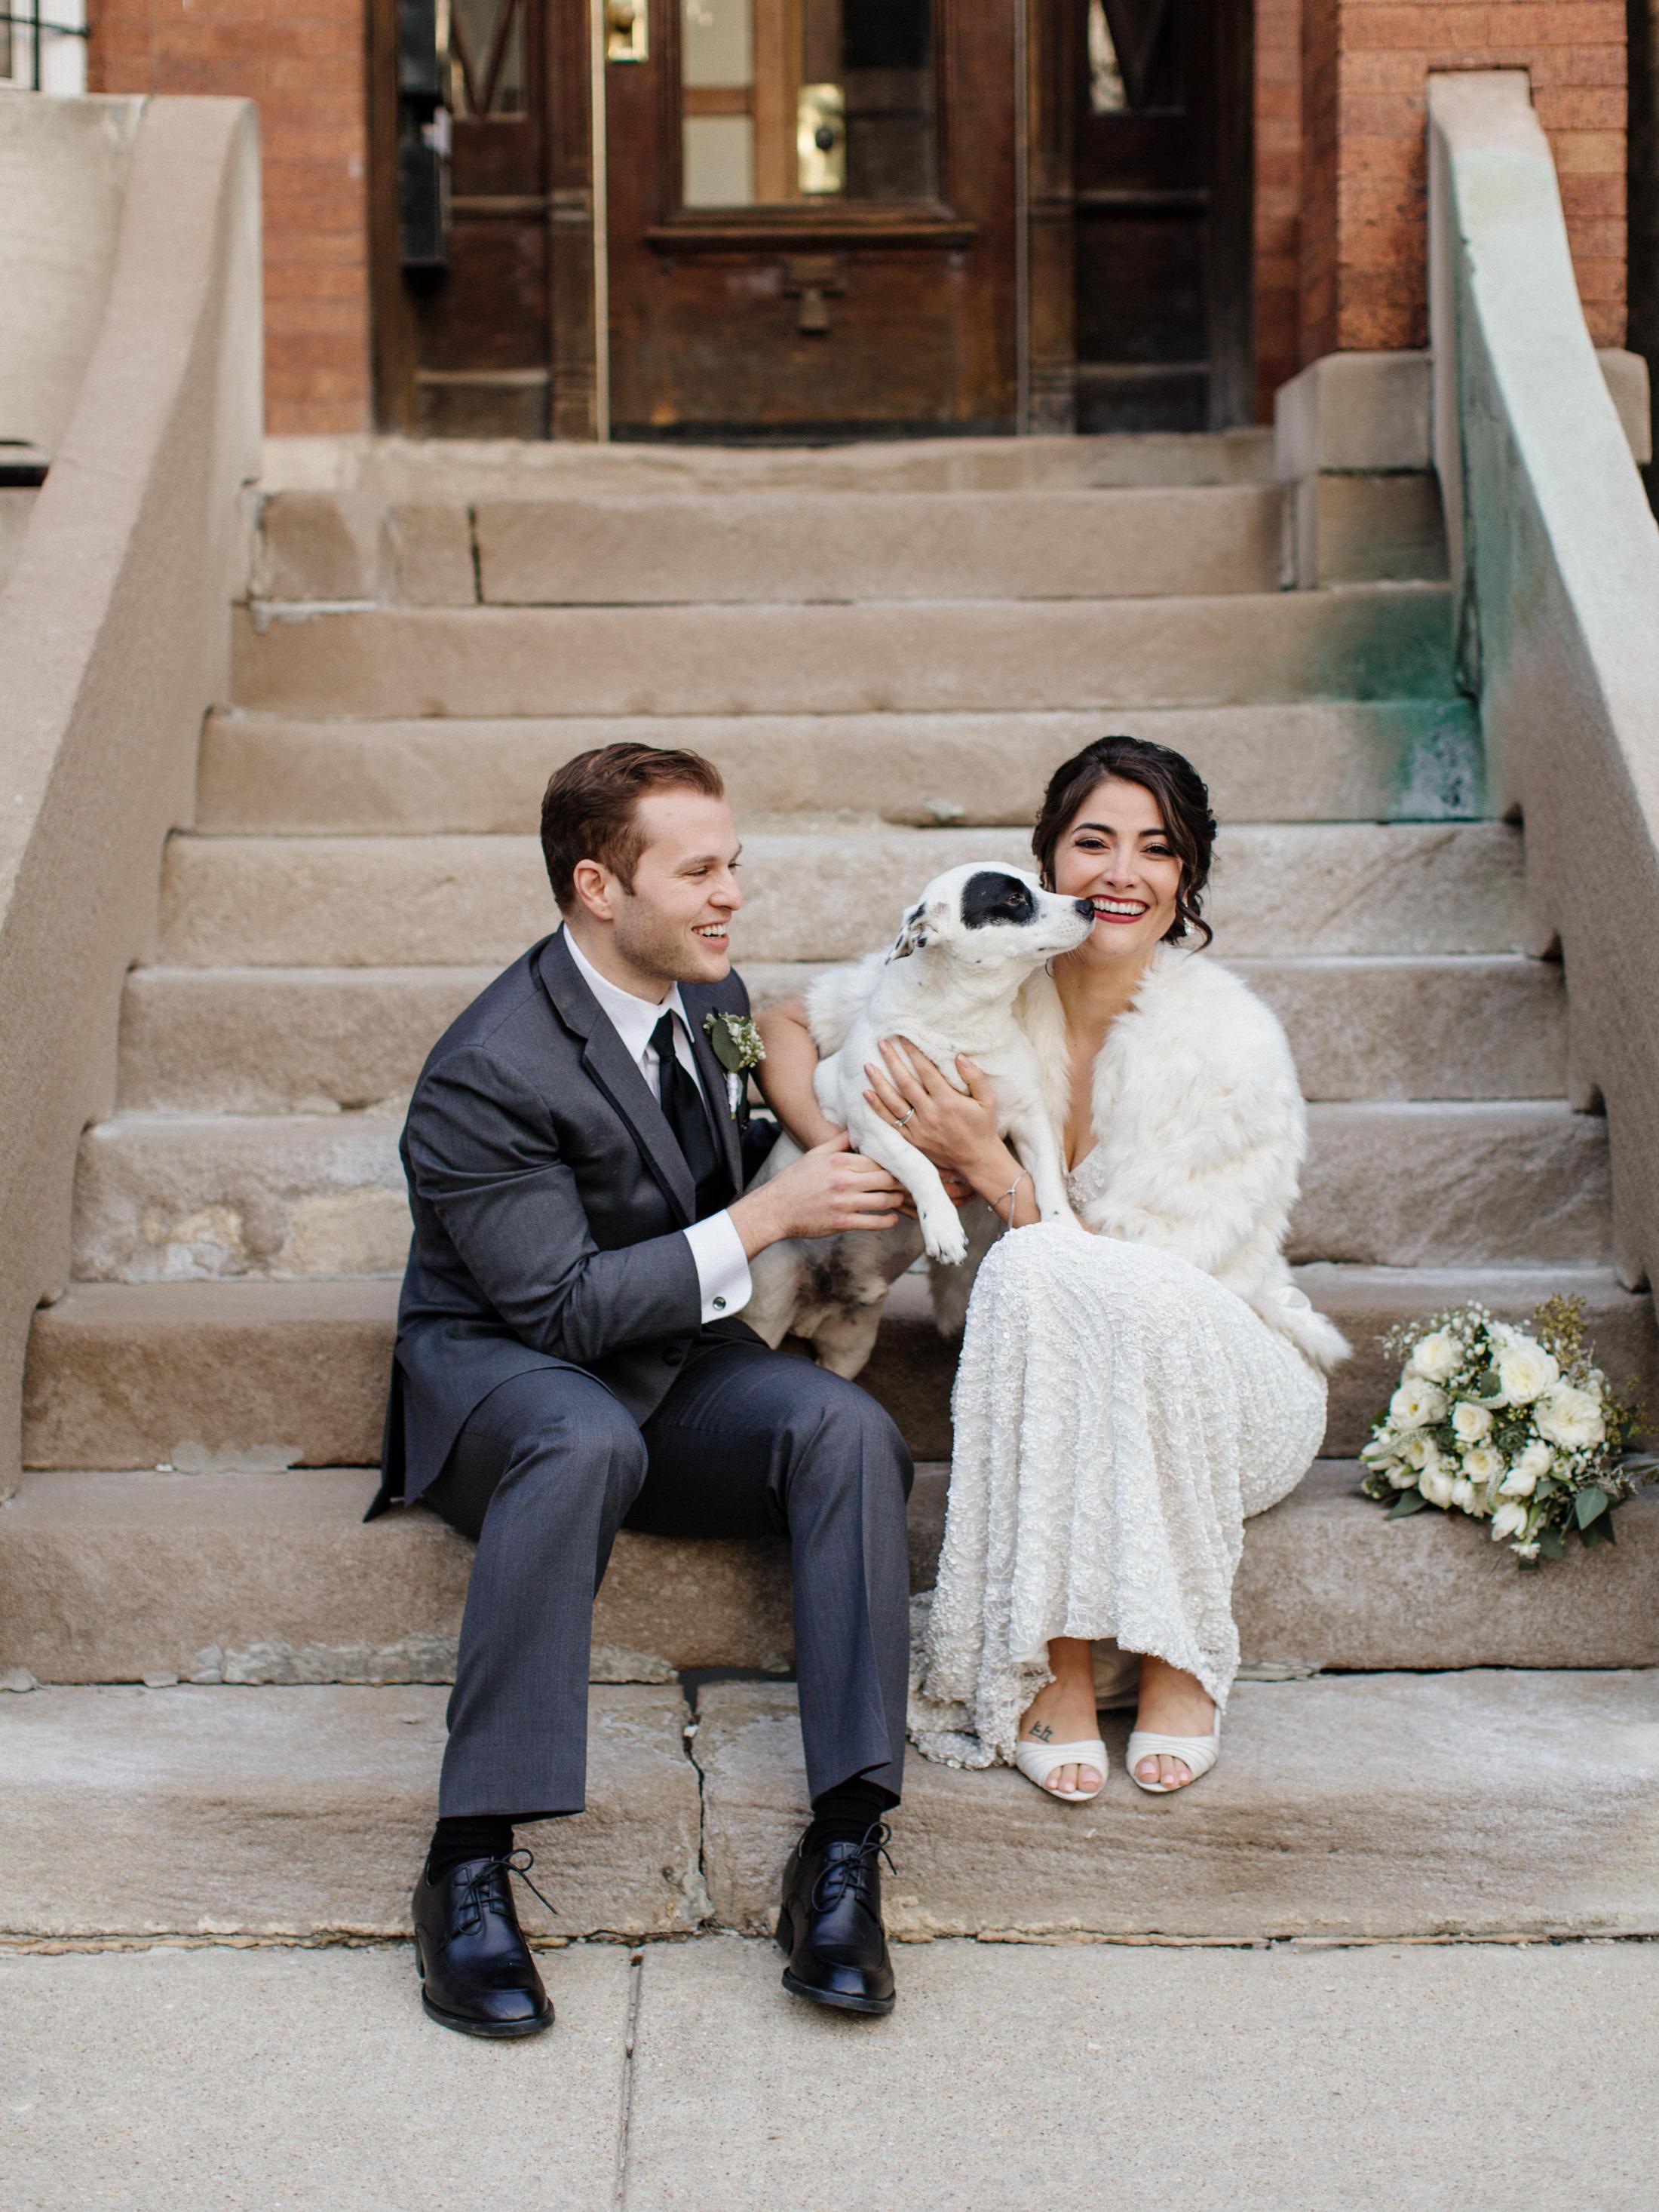 the_bristol_wedding-44.JPG